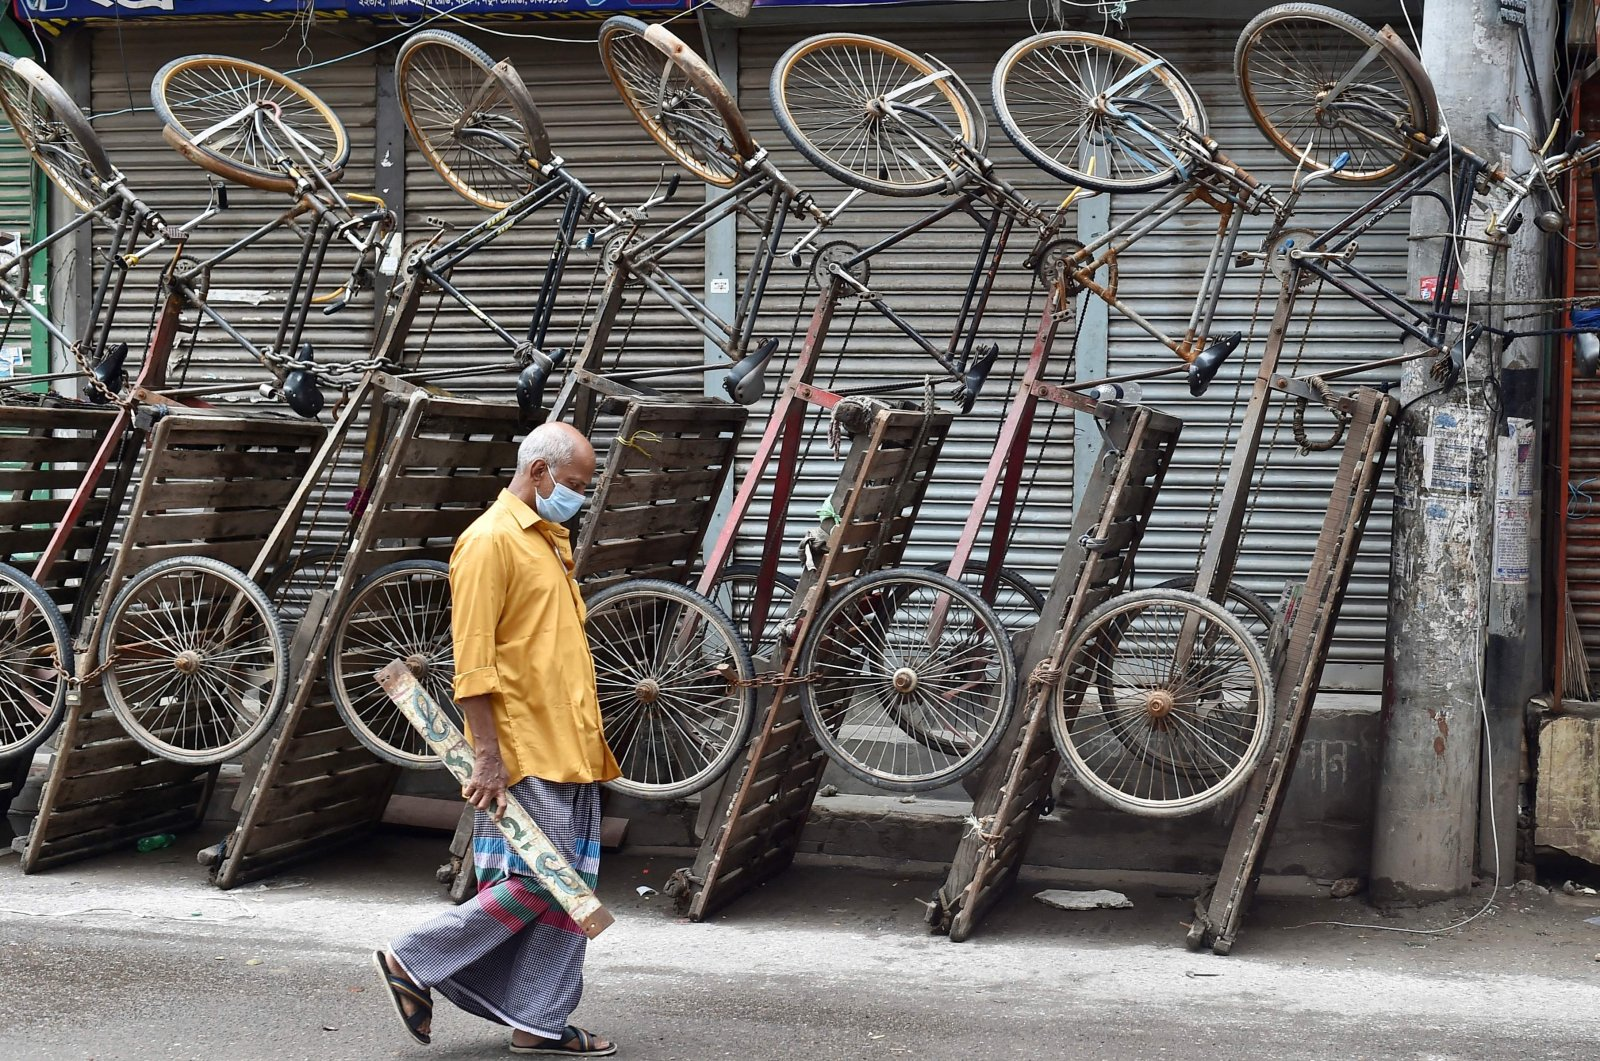 A man walks past parked bicycle carts along a street in Dhaka, Bangladesh, July 3, 2021. (AFP Photo)